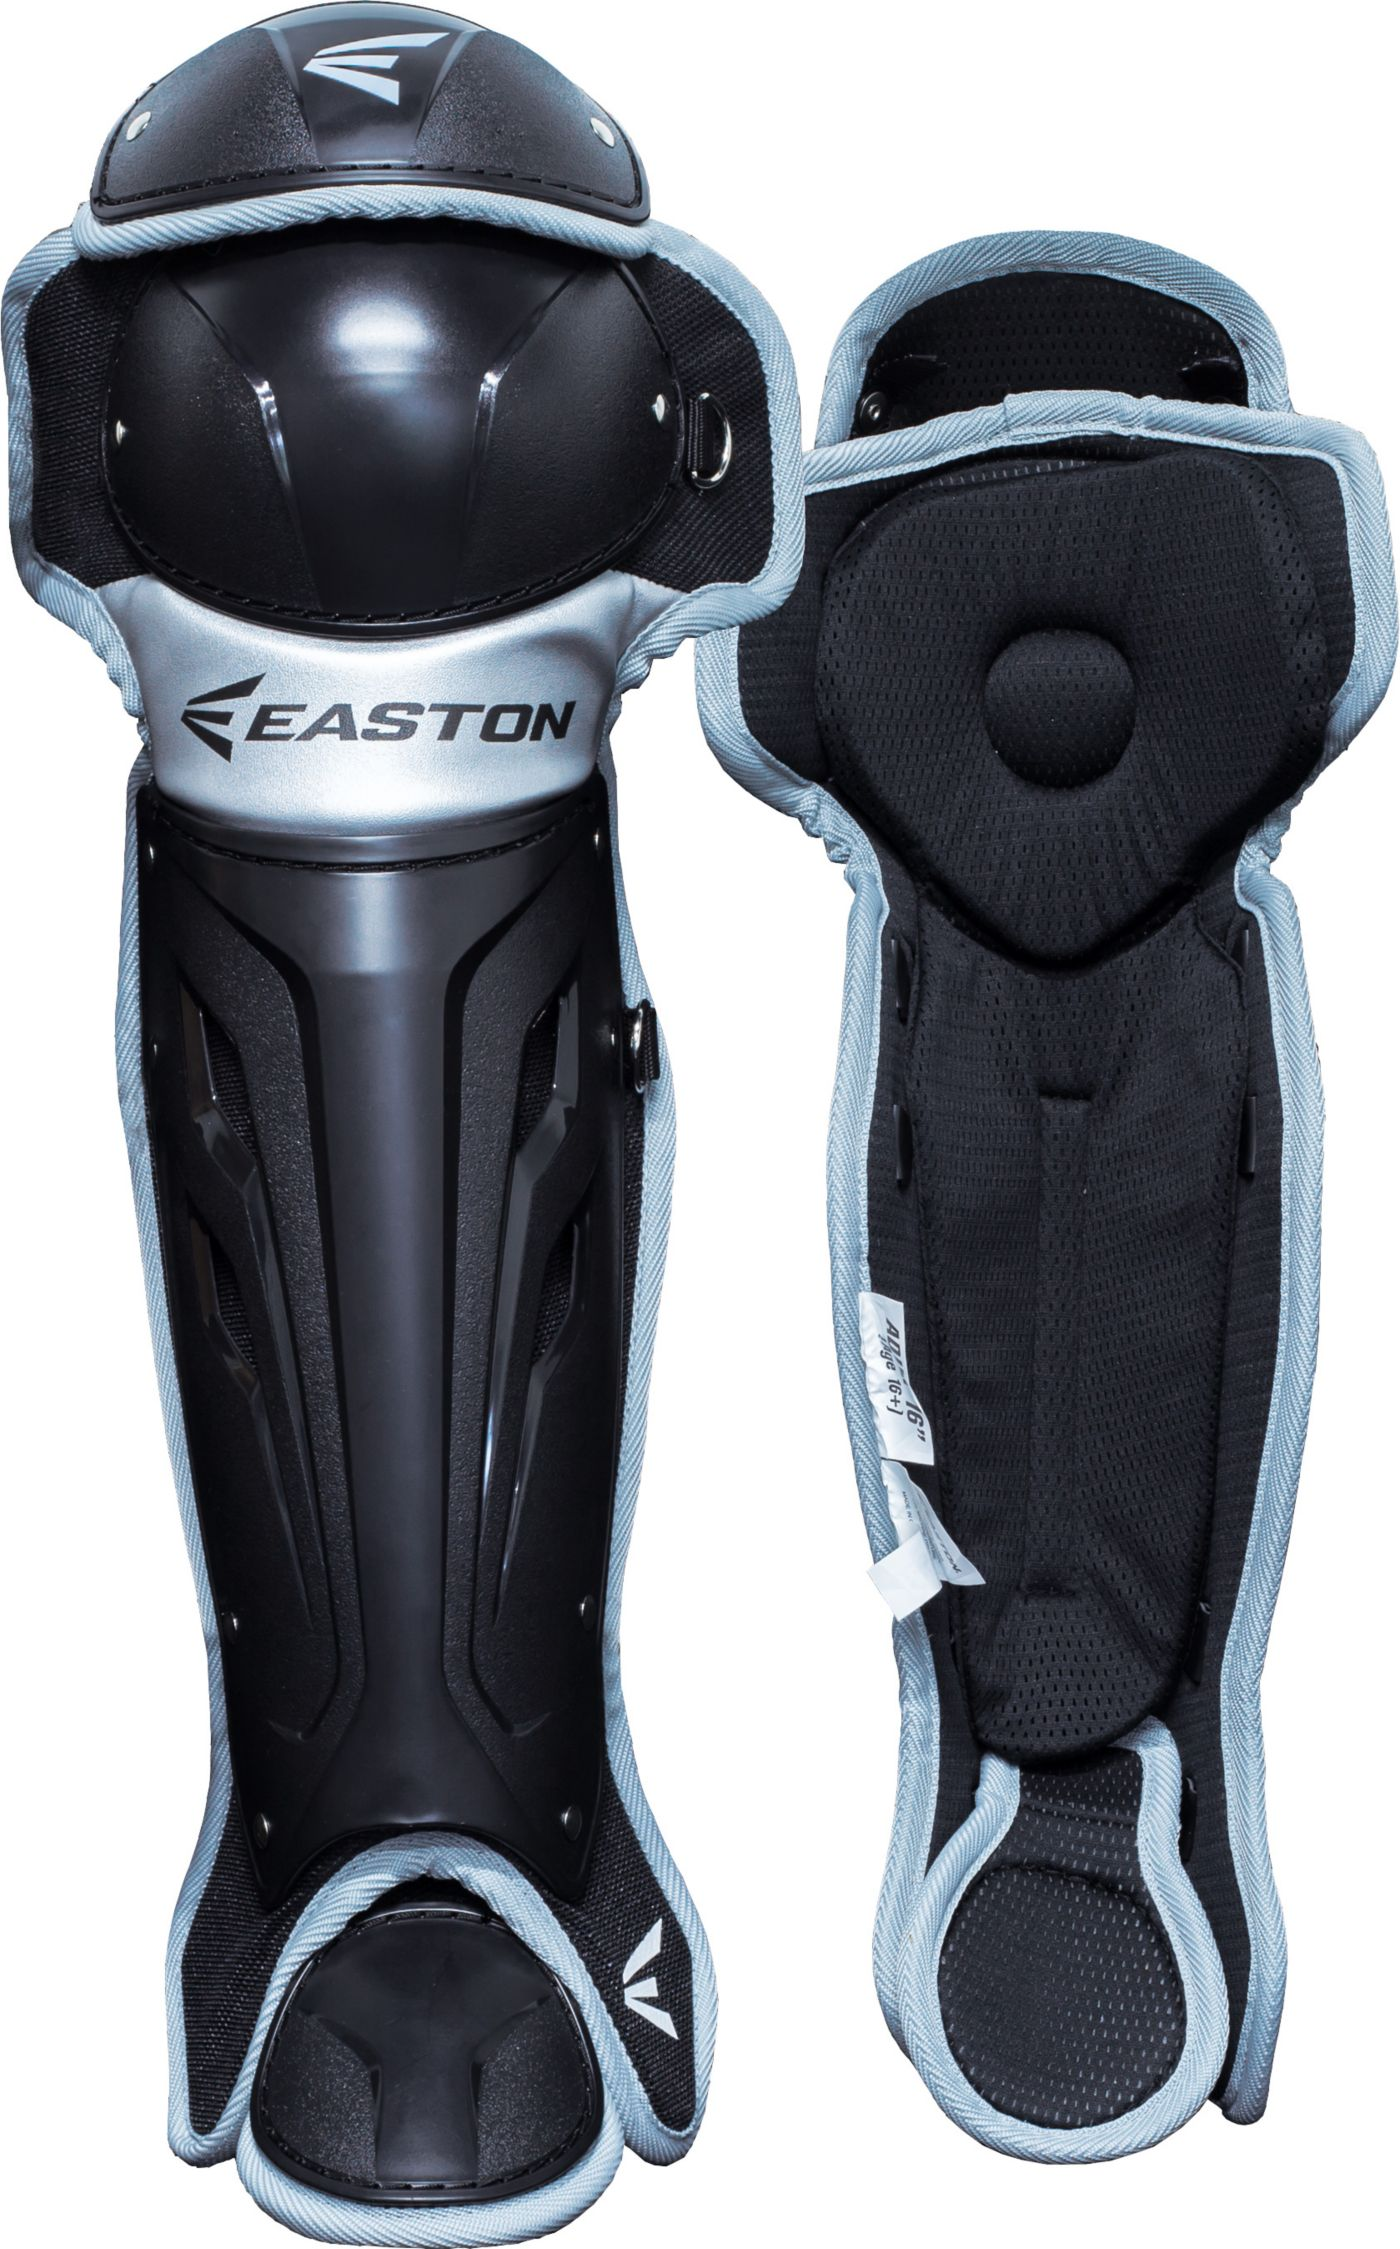 Easton Intermediate Gametime Elite Leg Guards